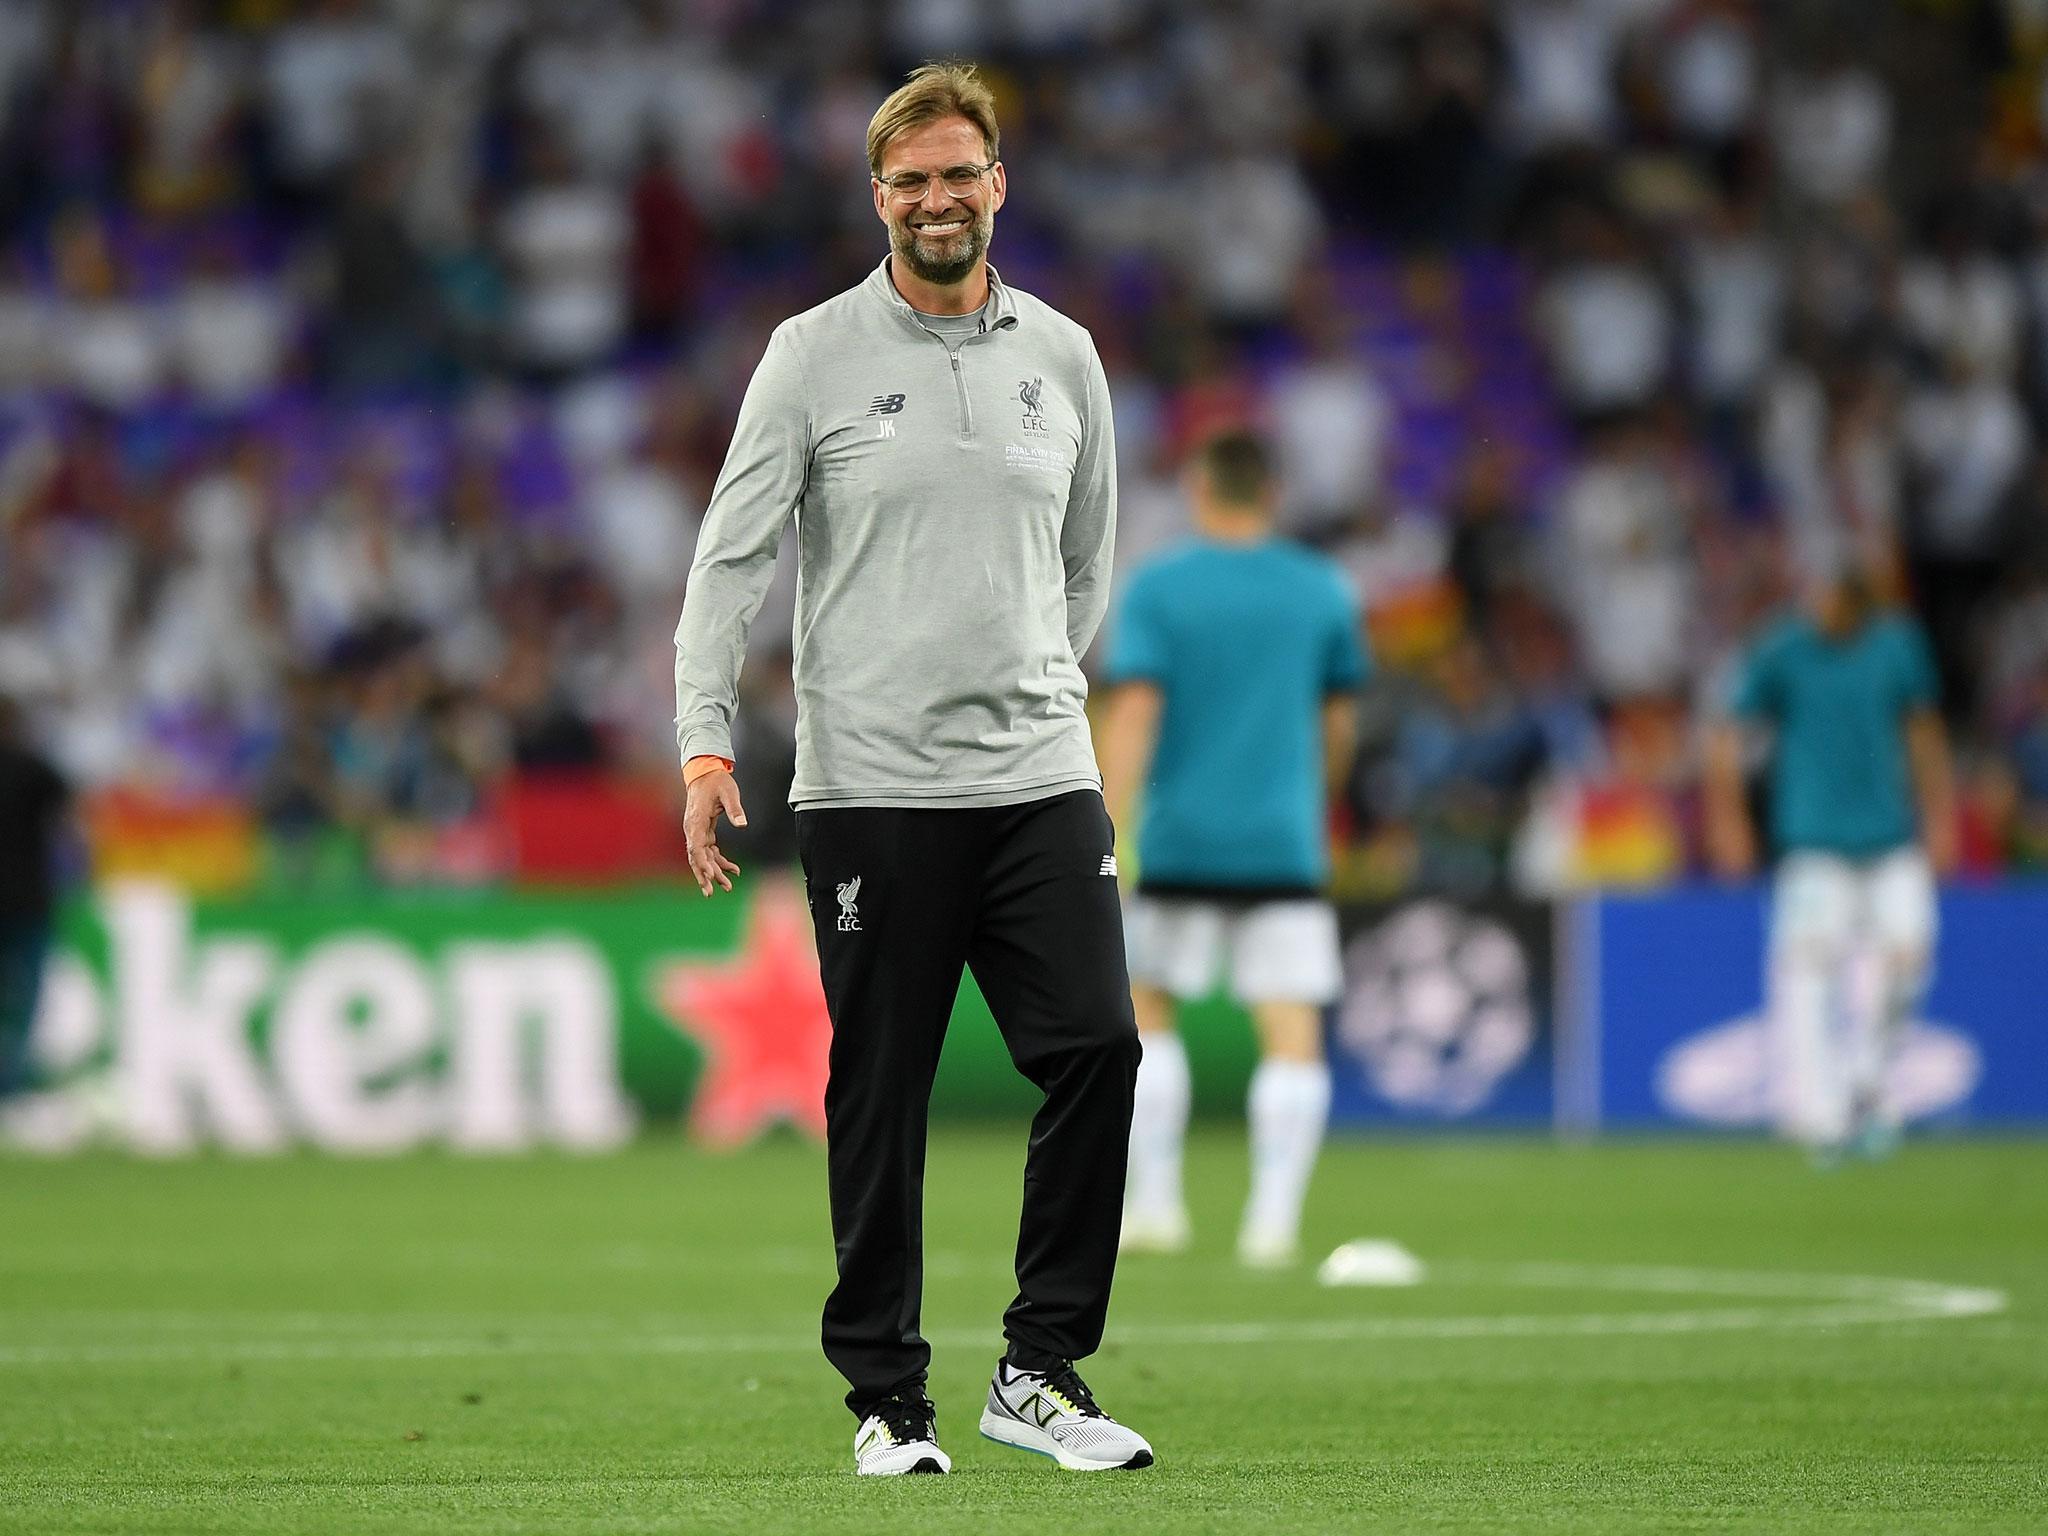 Liverpool sign Monaco's Fabinho on long-term contract | The